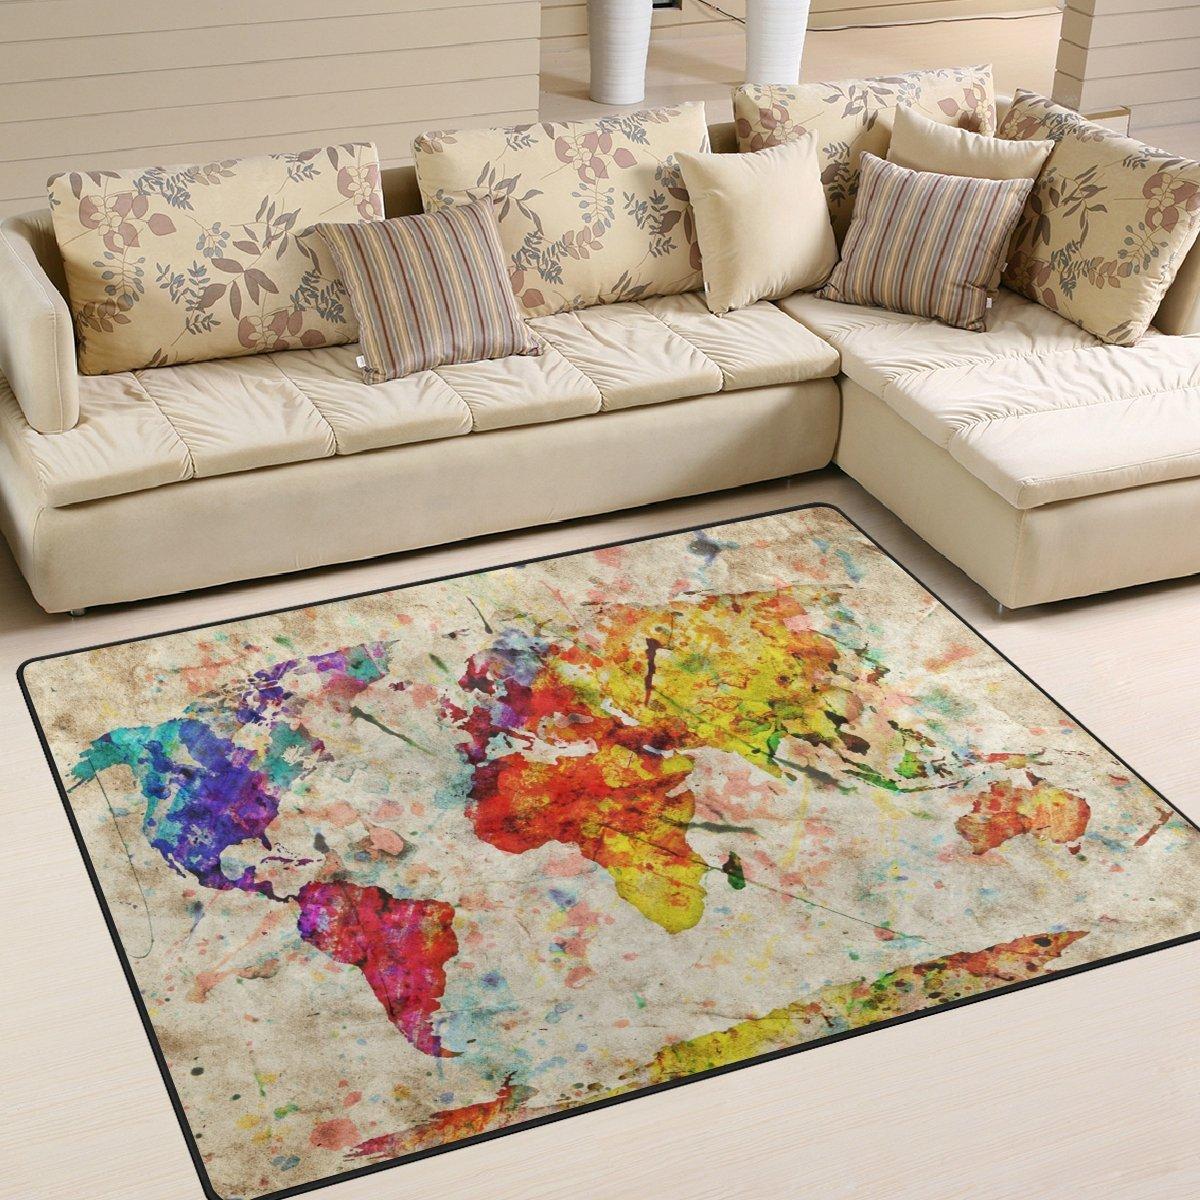 YZGO Vintage World Map Colorful Paint - Kids Children Area Rugs Non-Slip Floor Mat Resting Area Doormats